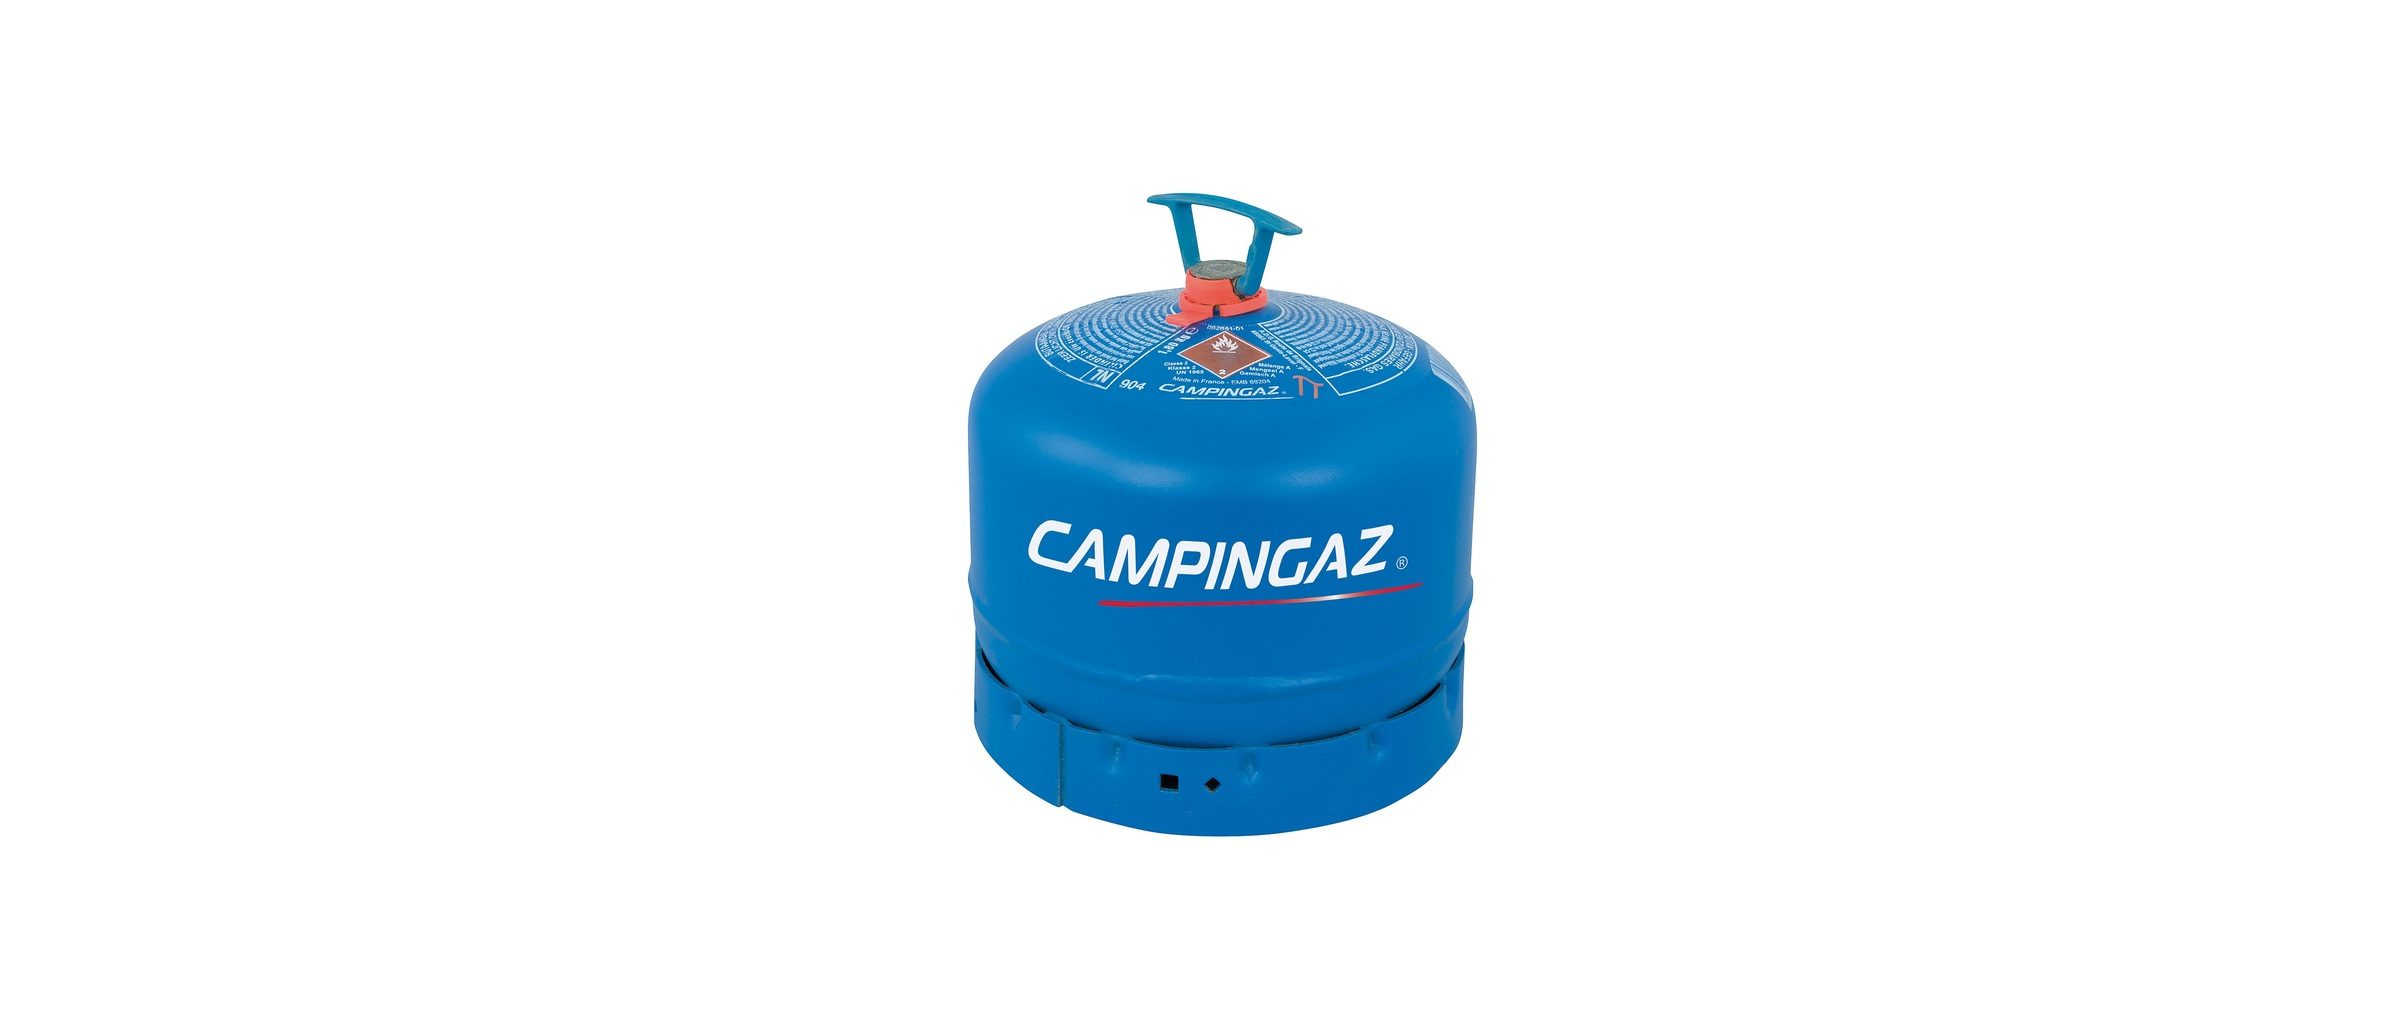 Campingaz 904 Cylinder